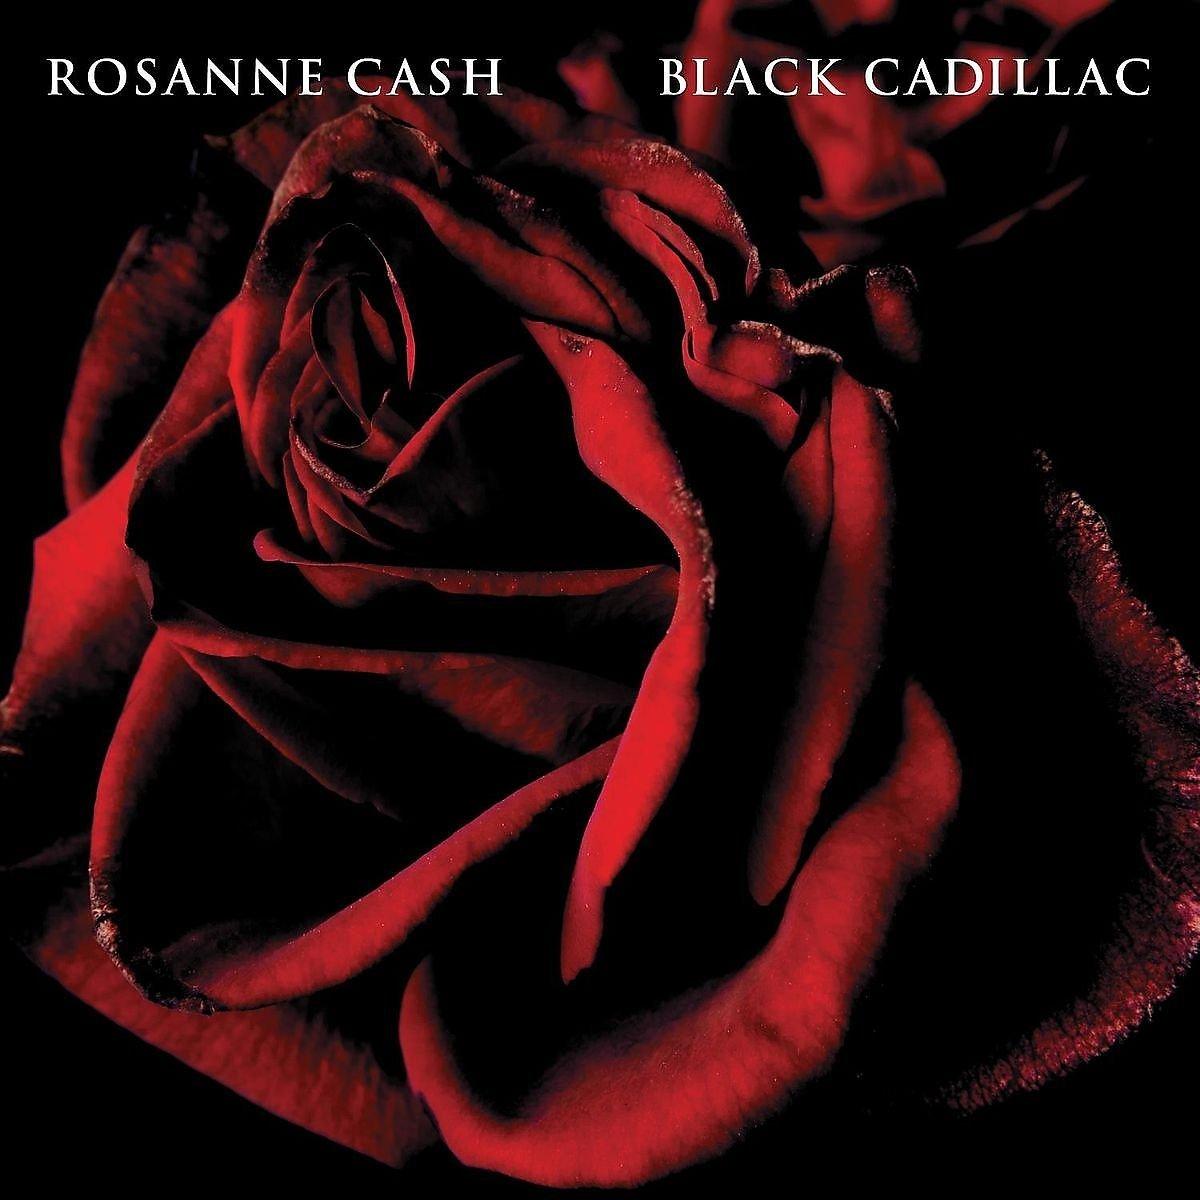 Розанн Кэш Rosanne Cash. Black Cadillac